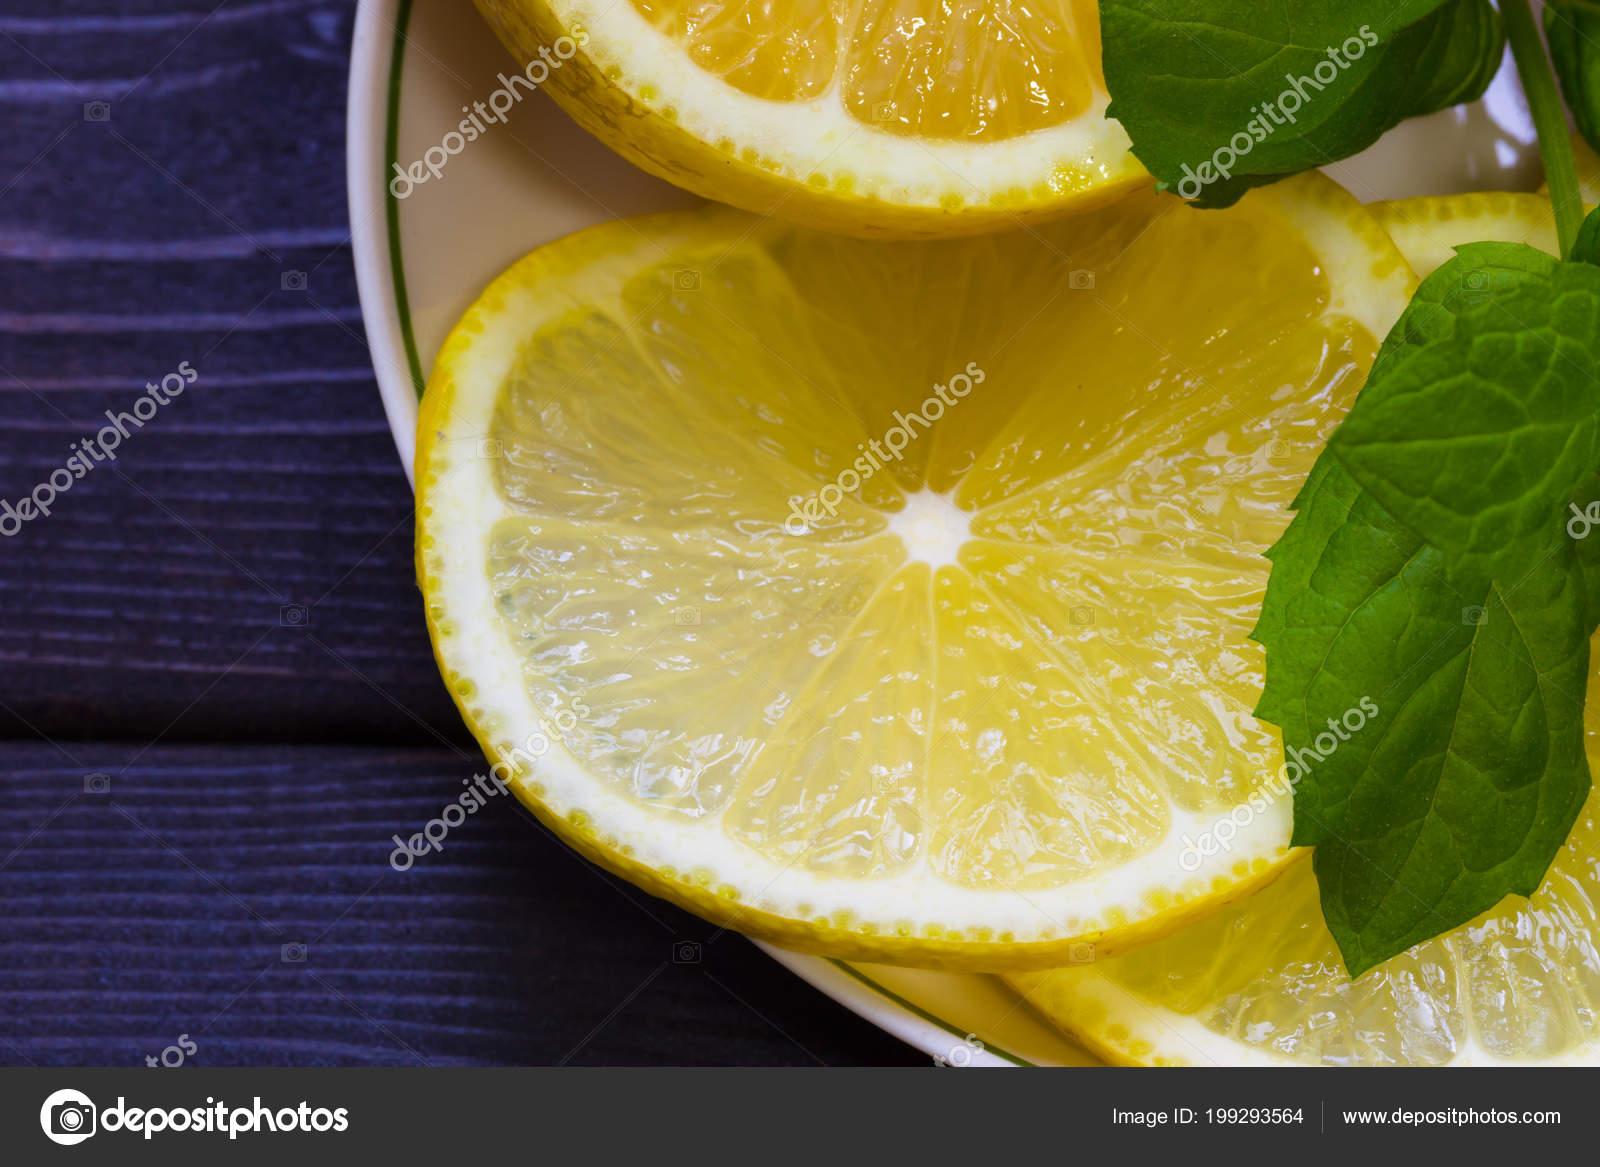 Лайм желтого цвета